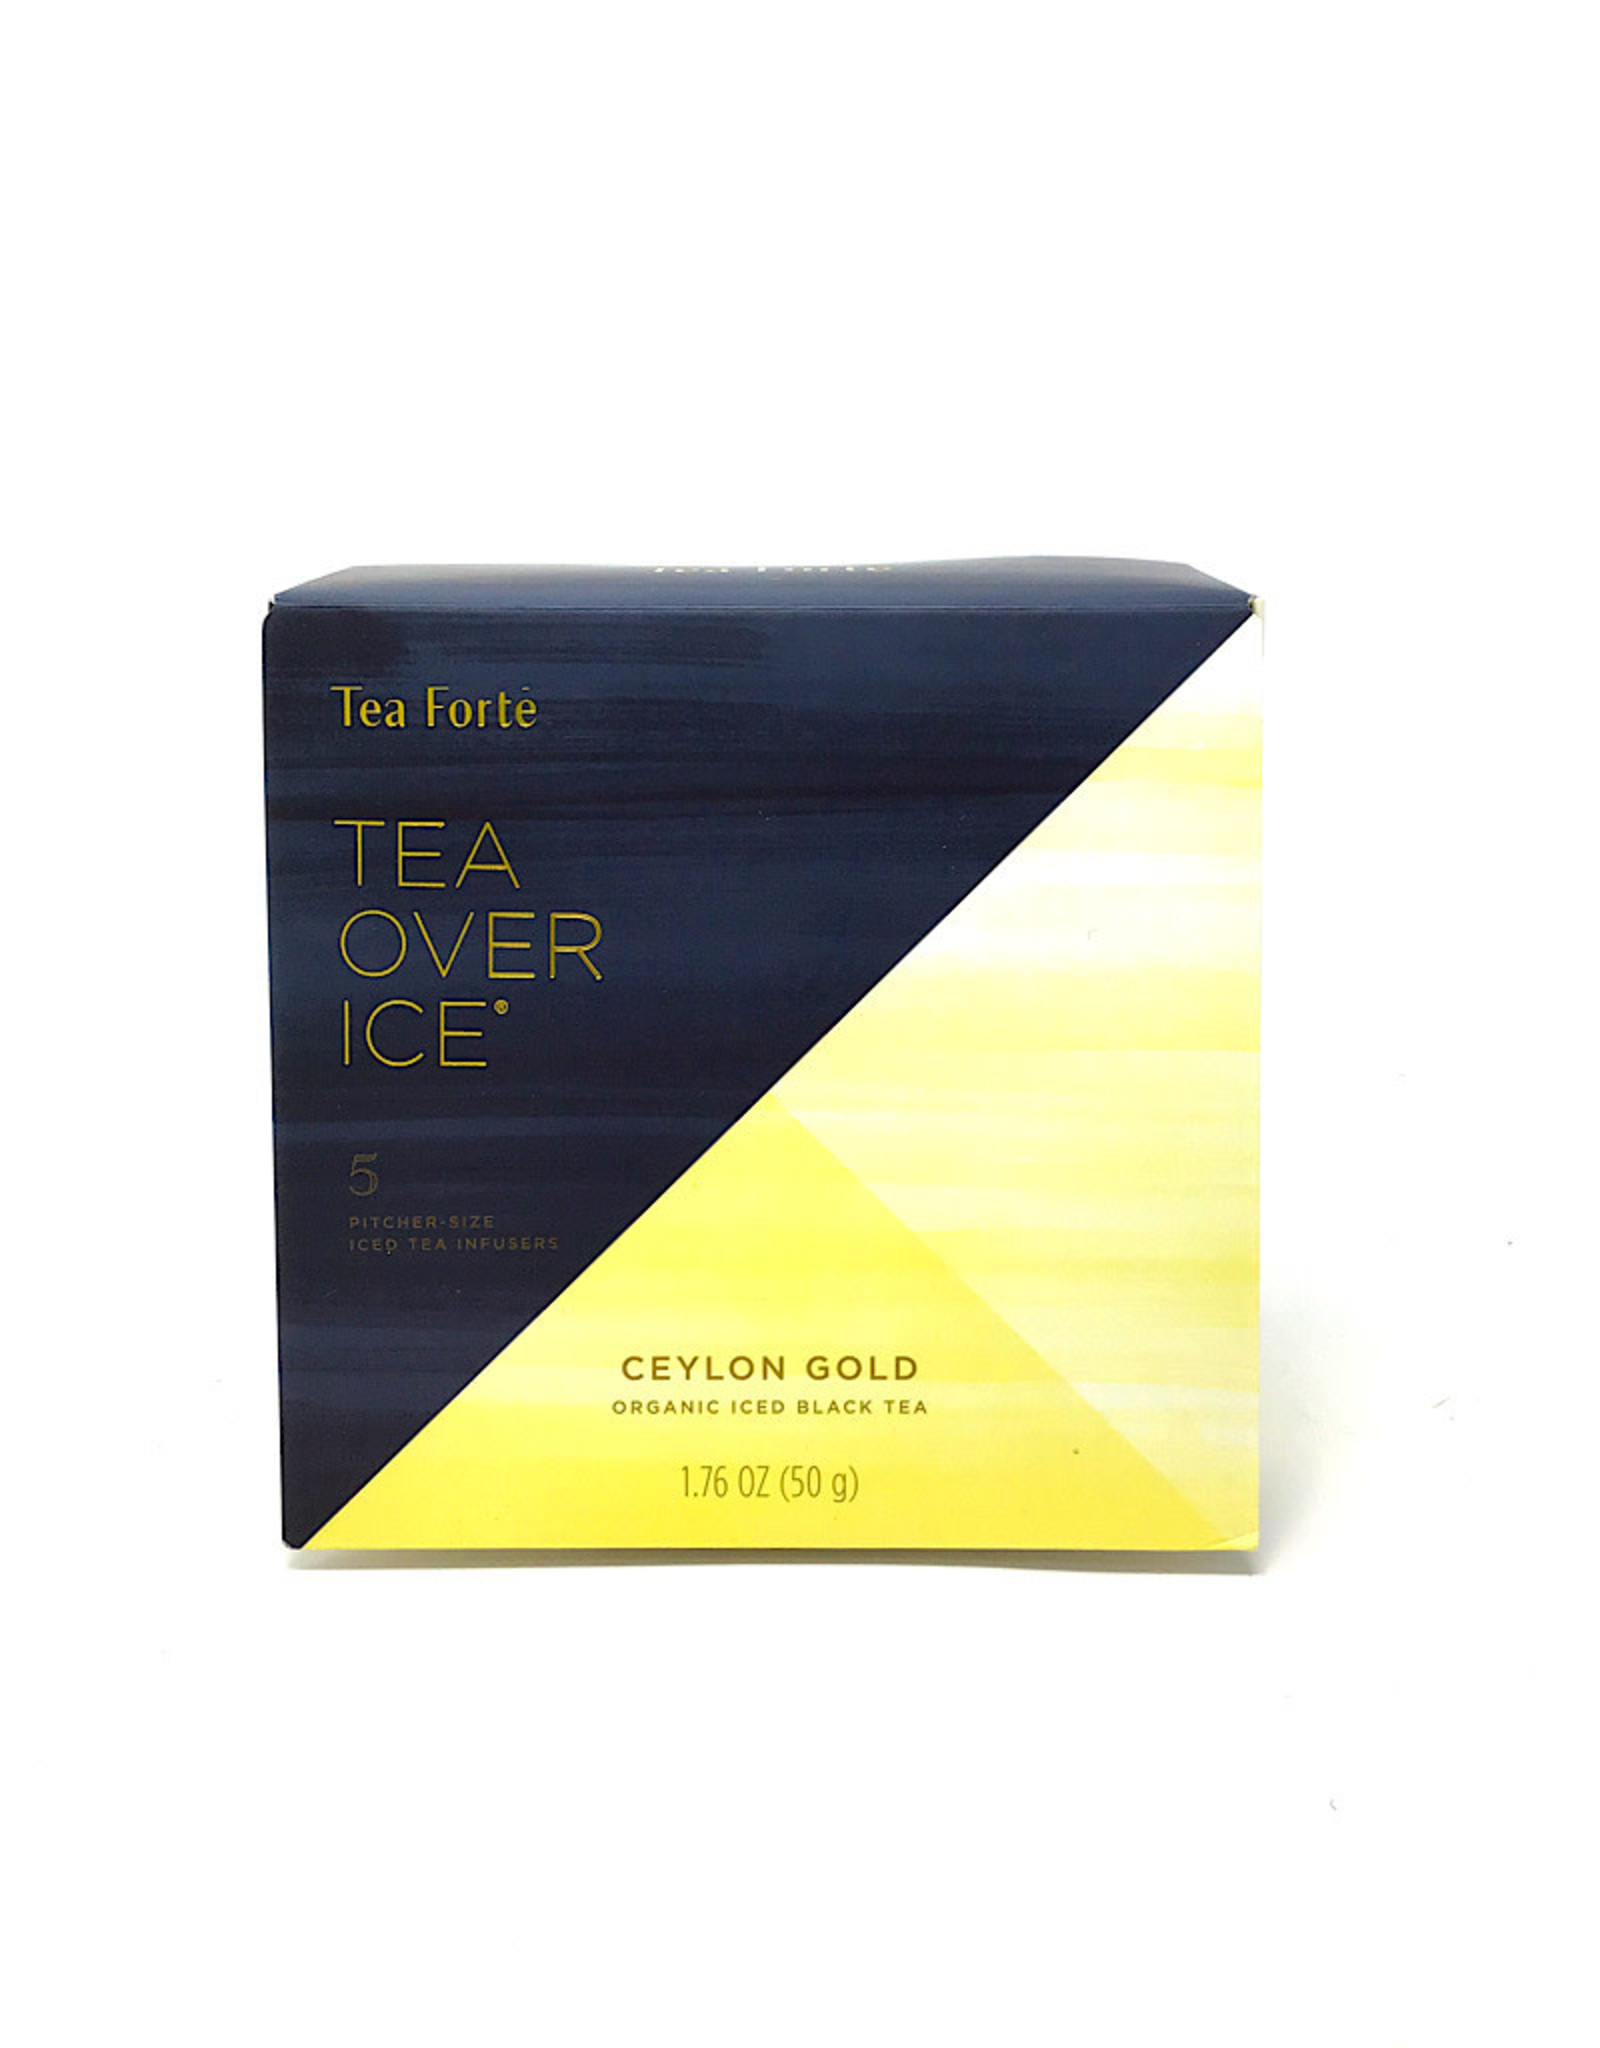 Tea Forte Ceylon Gold Organic Iced Black Tea